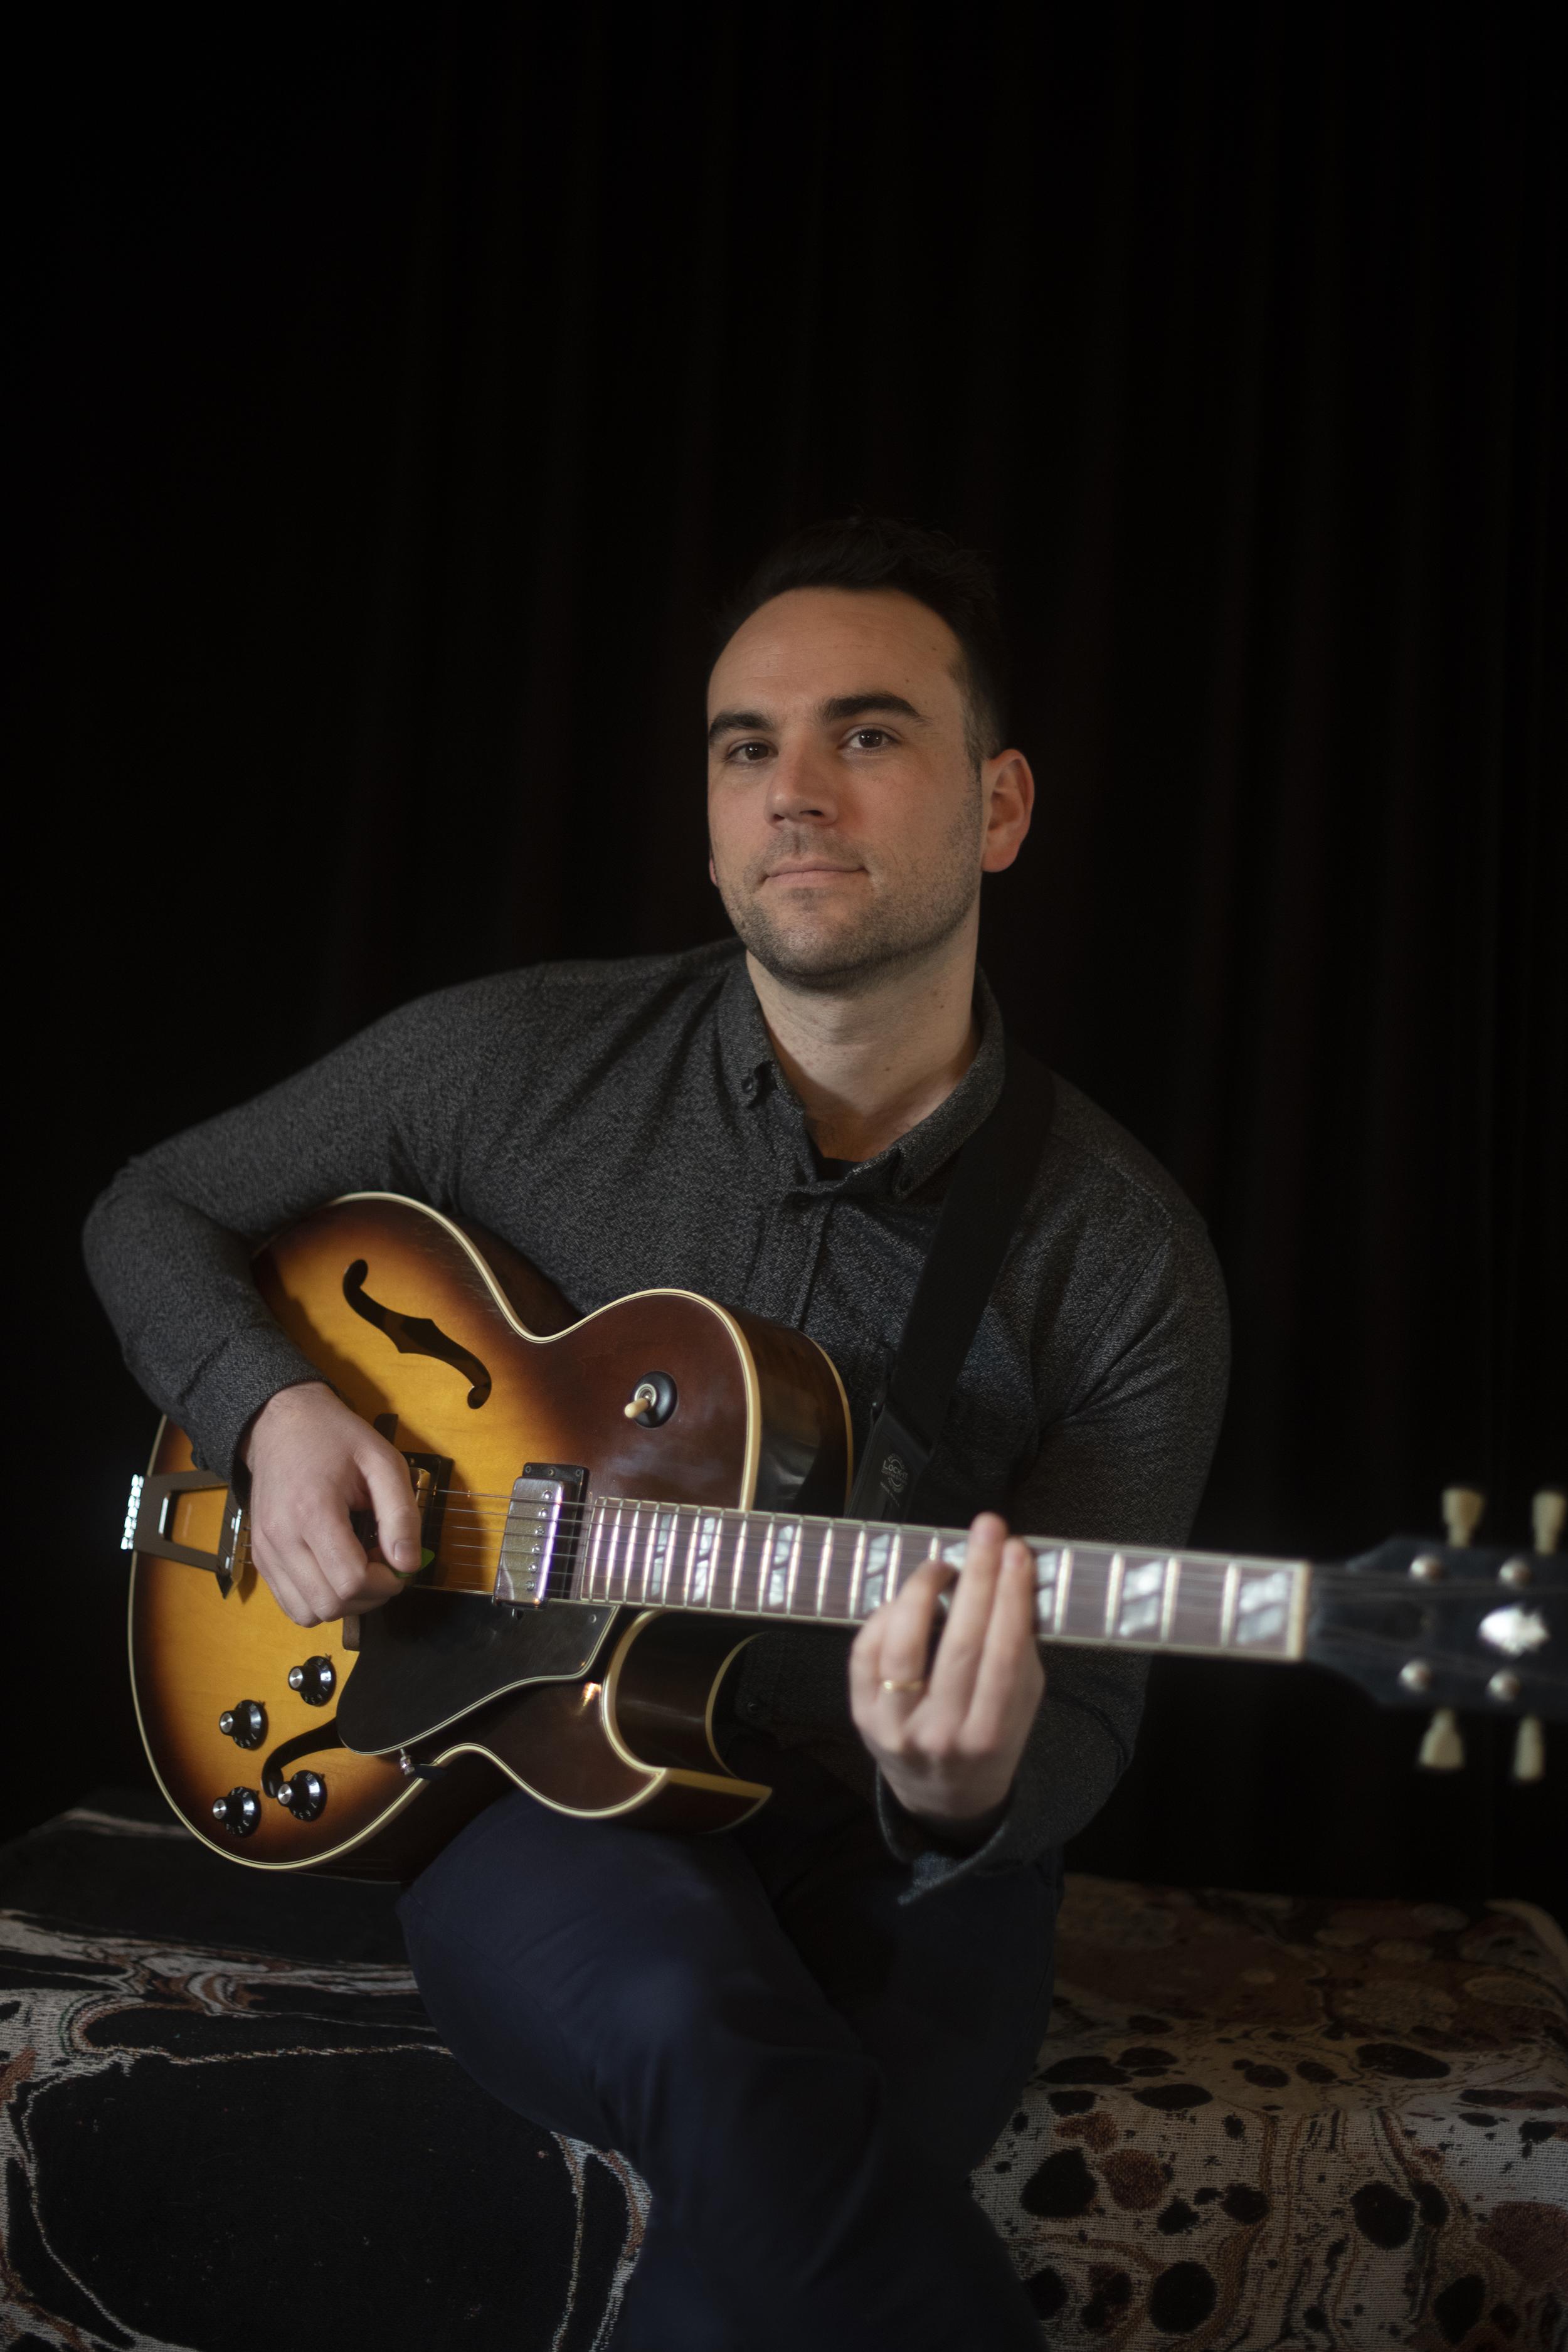 guitar_teaching_008_web.jpg